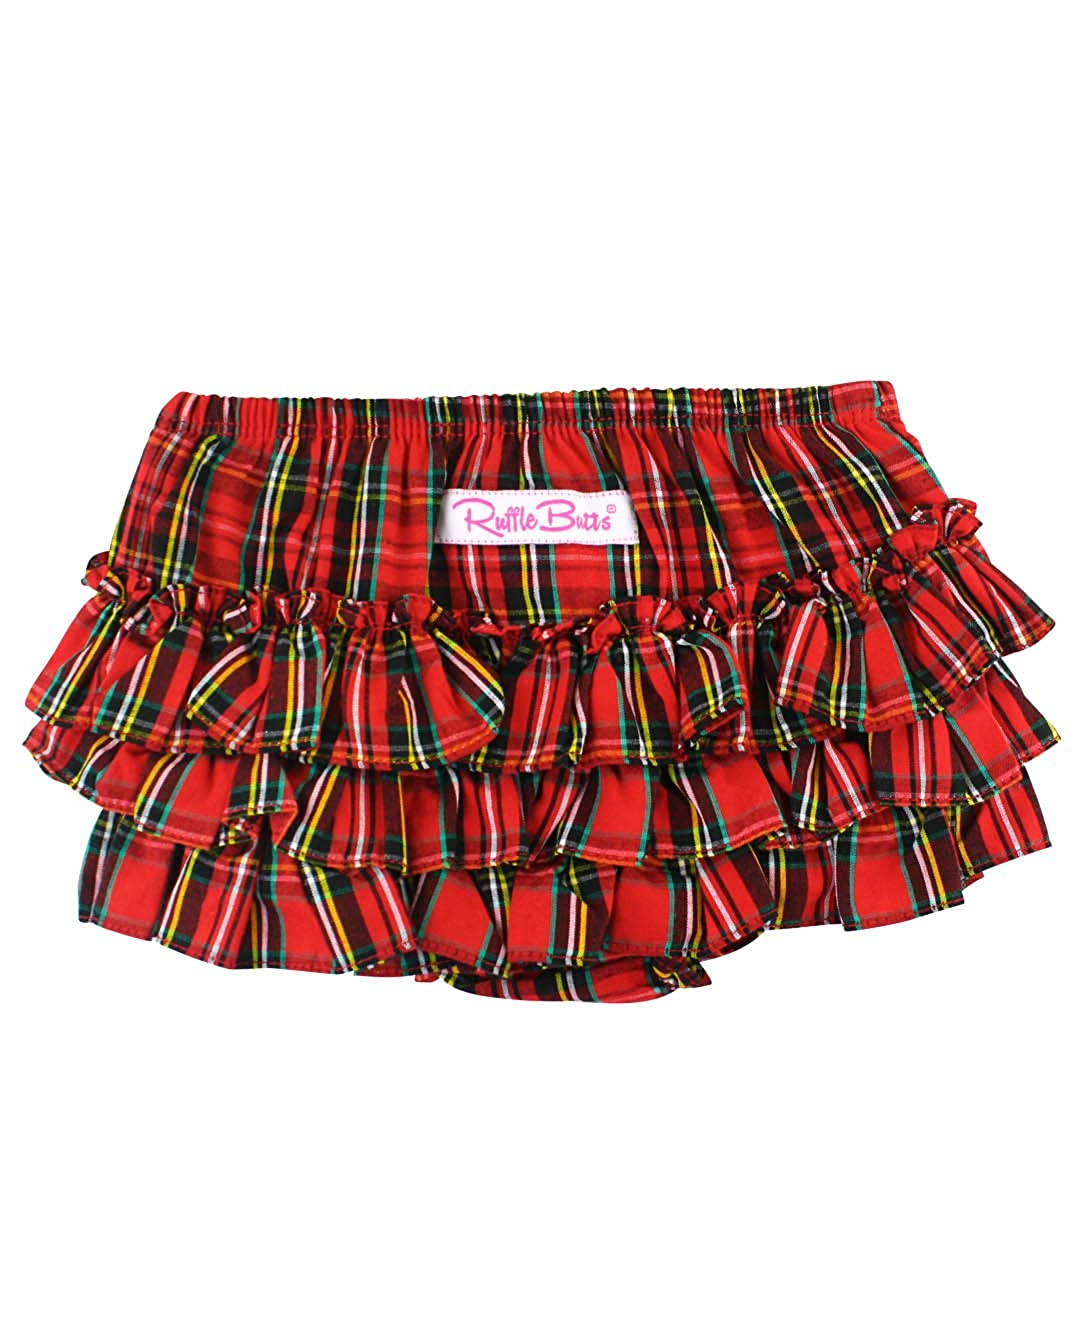 RuffleButts Baby//Toddler Girls Fall Holiday Plaid Bloomer Diaper Cover w//Ruffles RBWPLXX-FALL-SC-BABY